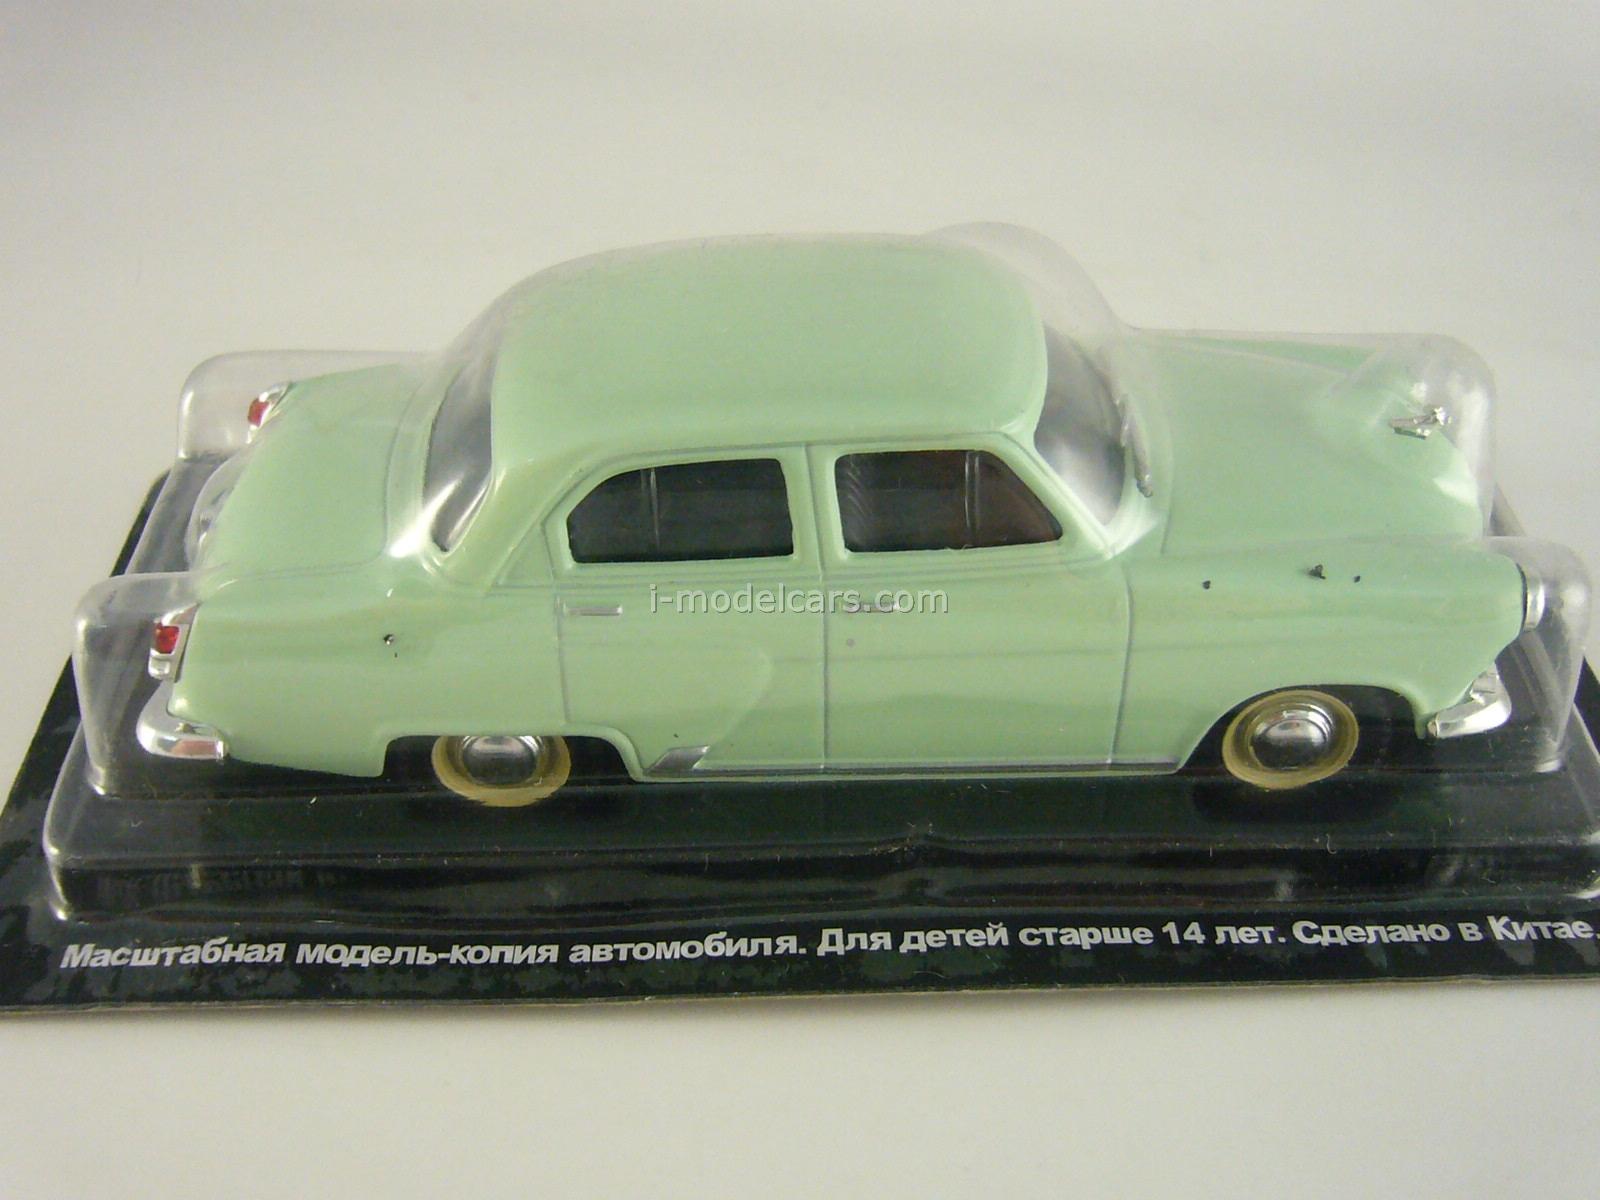 GAZ-M21I Volga light green 1:43 DeAgostini Auto Legends USSR #6